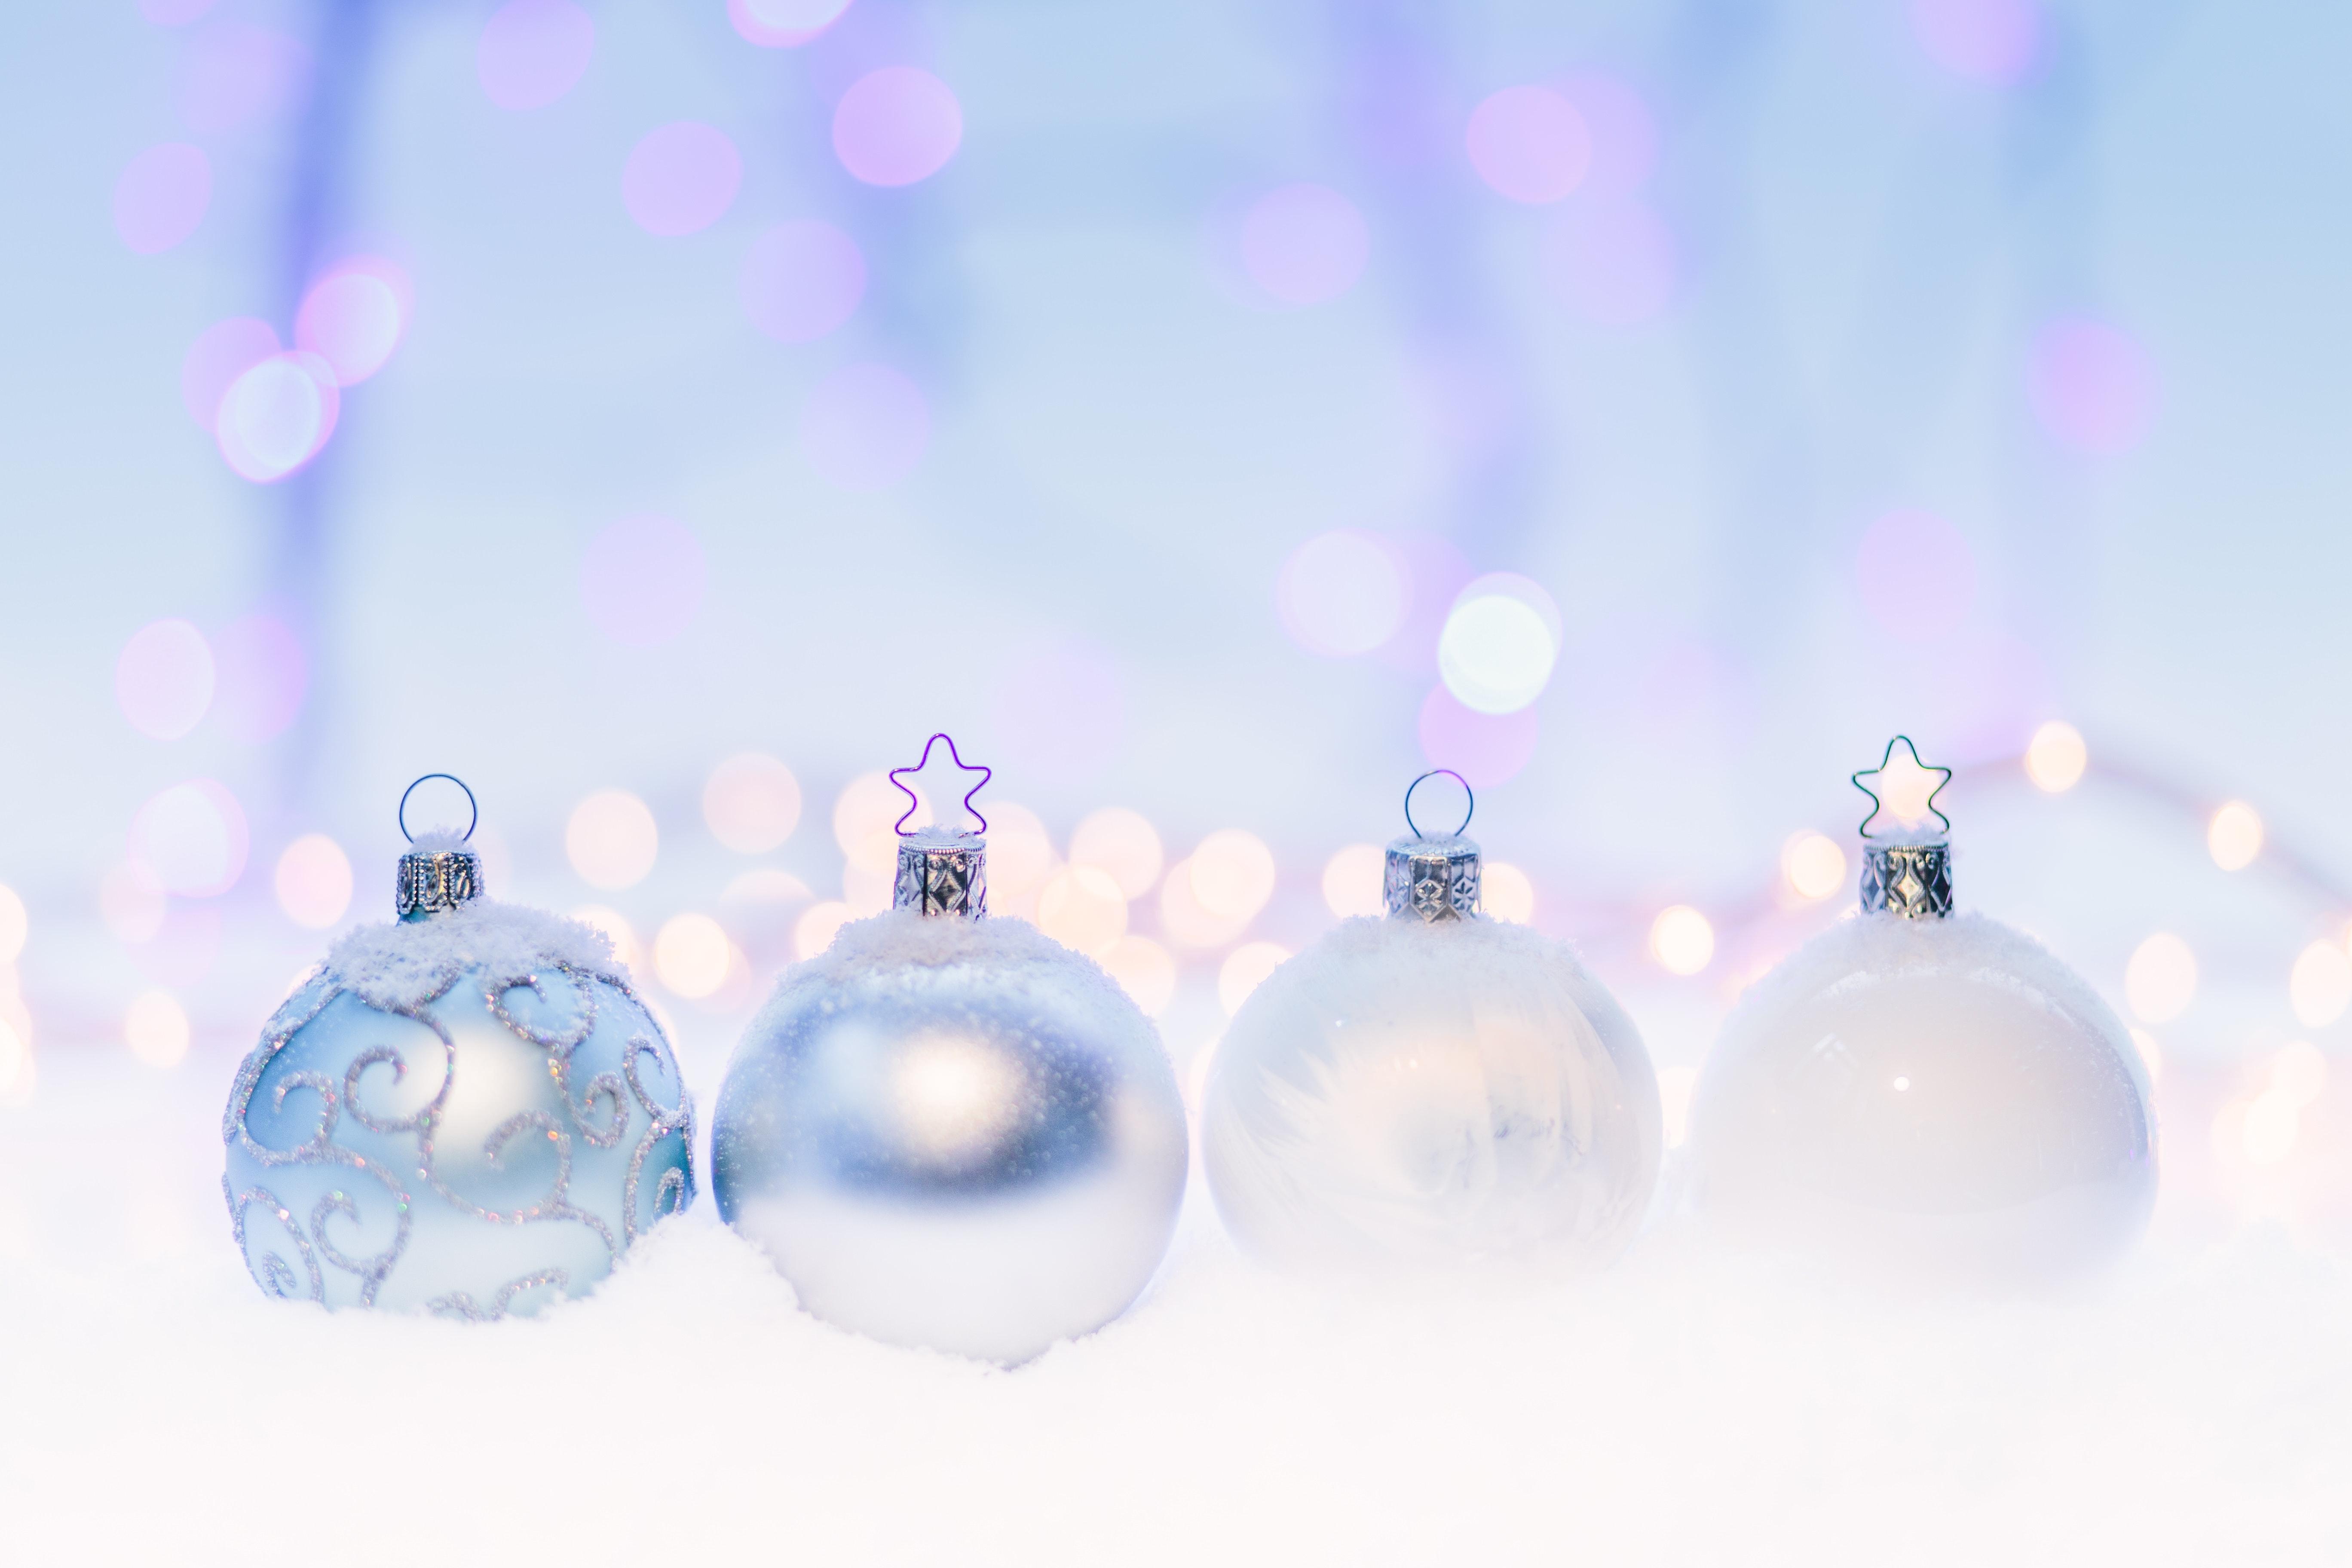 Immagini Natalizie Gratuite.Foto Gratuita Di Carta Da Parati Festiva Decorazioni Natalizie Inverno